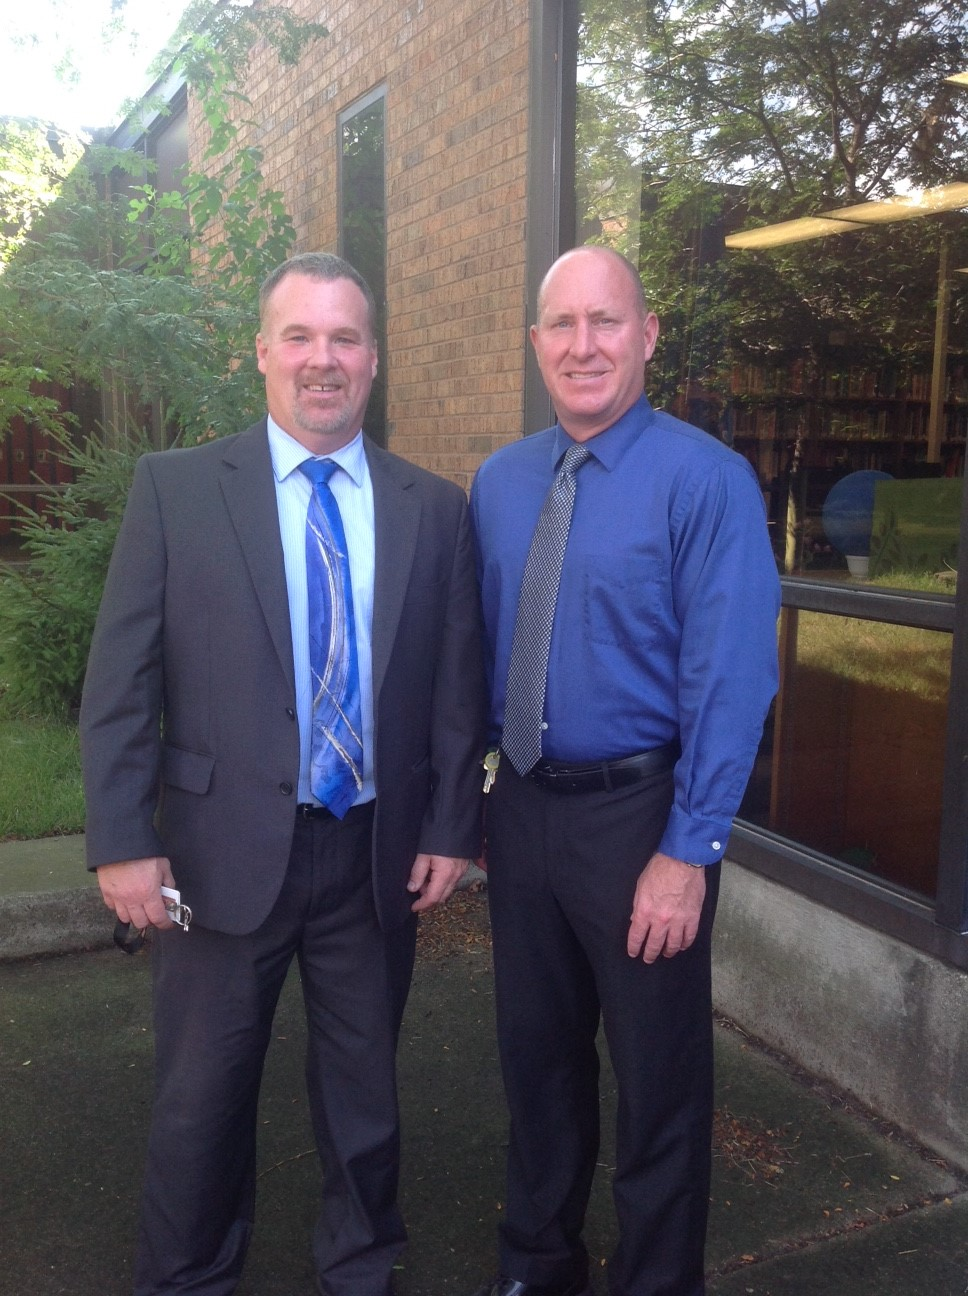 Mr. Breithaupt- Principal, Mr. Lawson- Asst. Principal